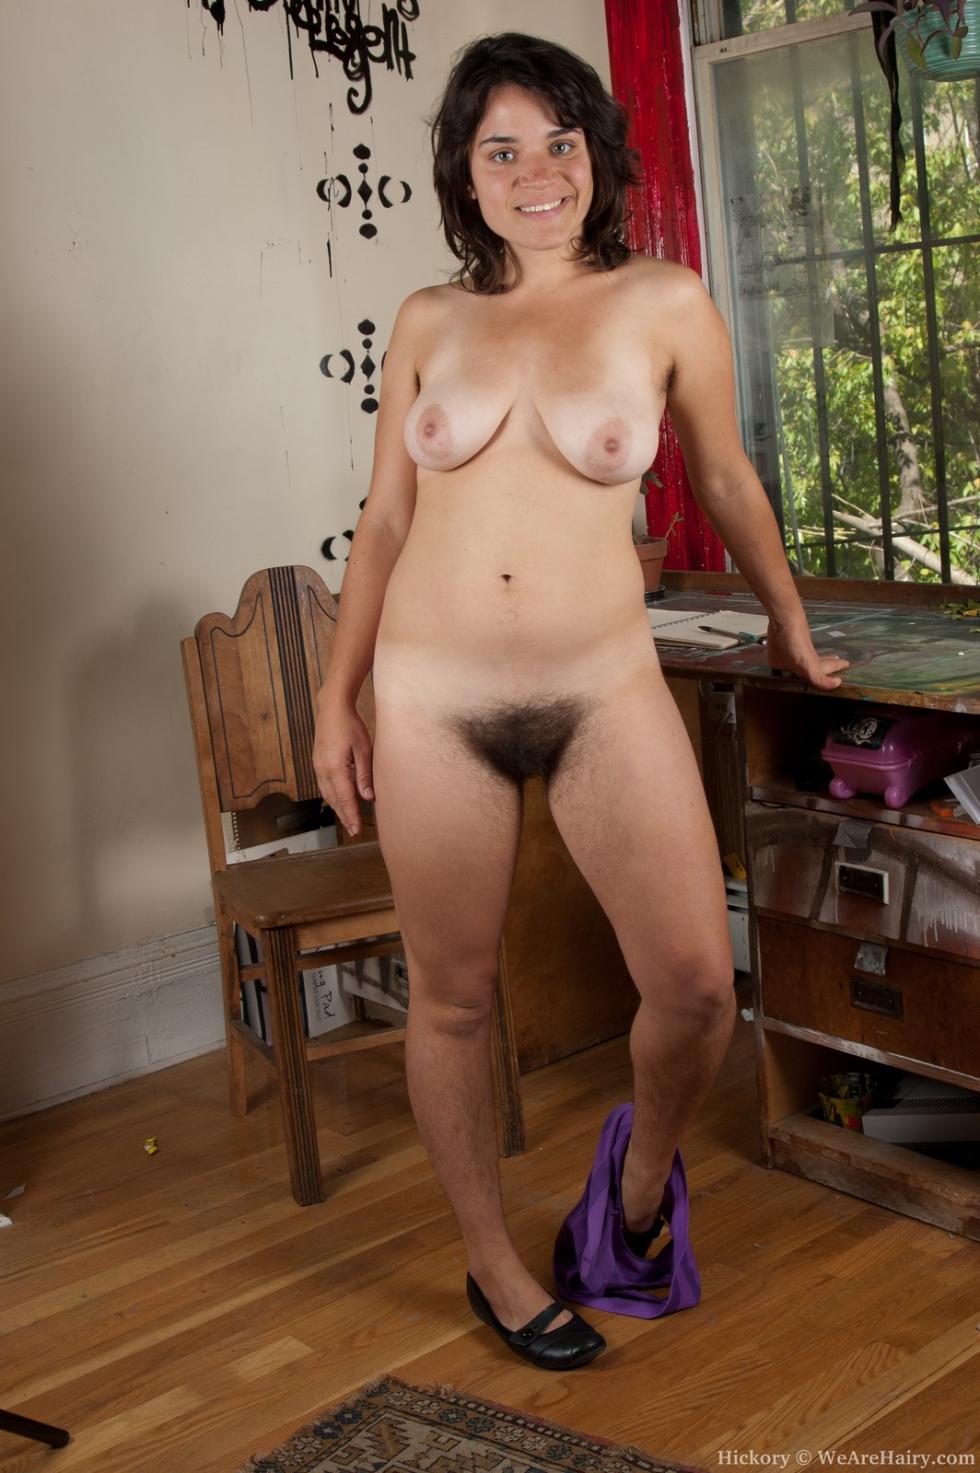 annasophia robb fake nude pic